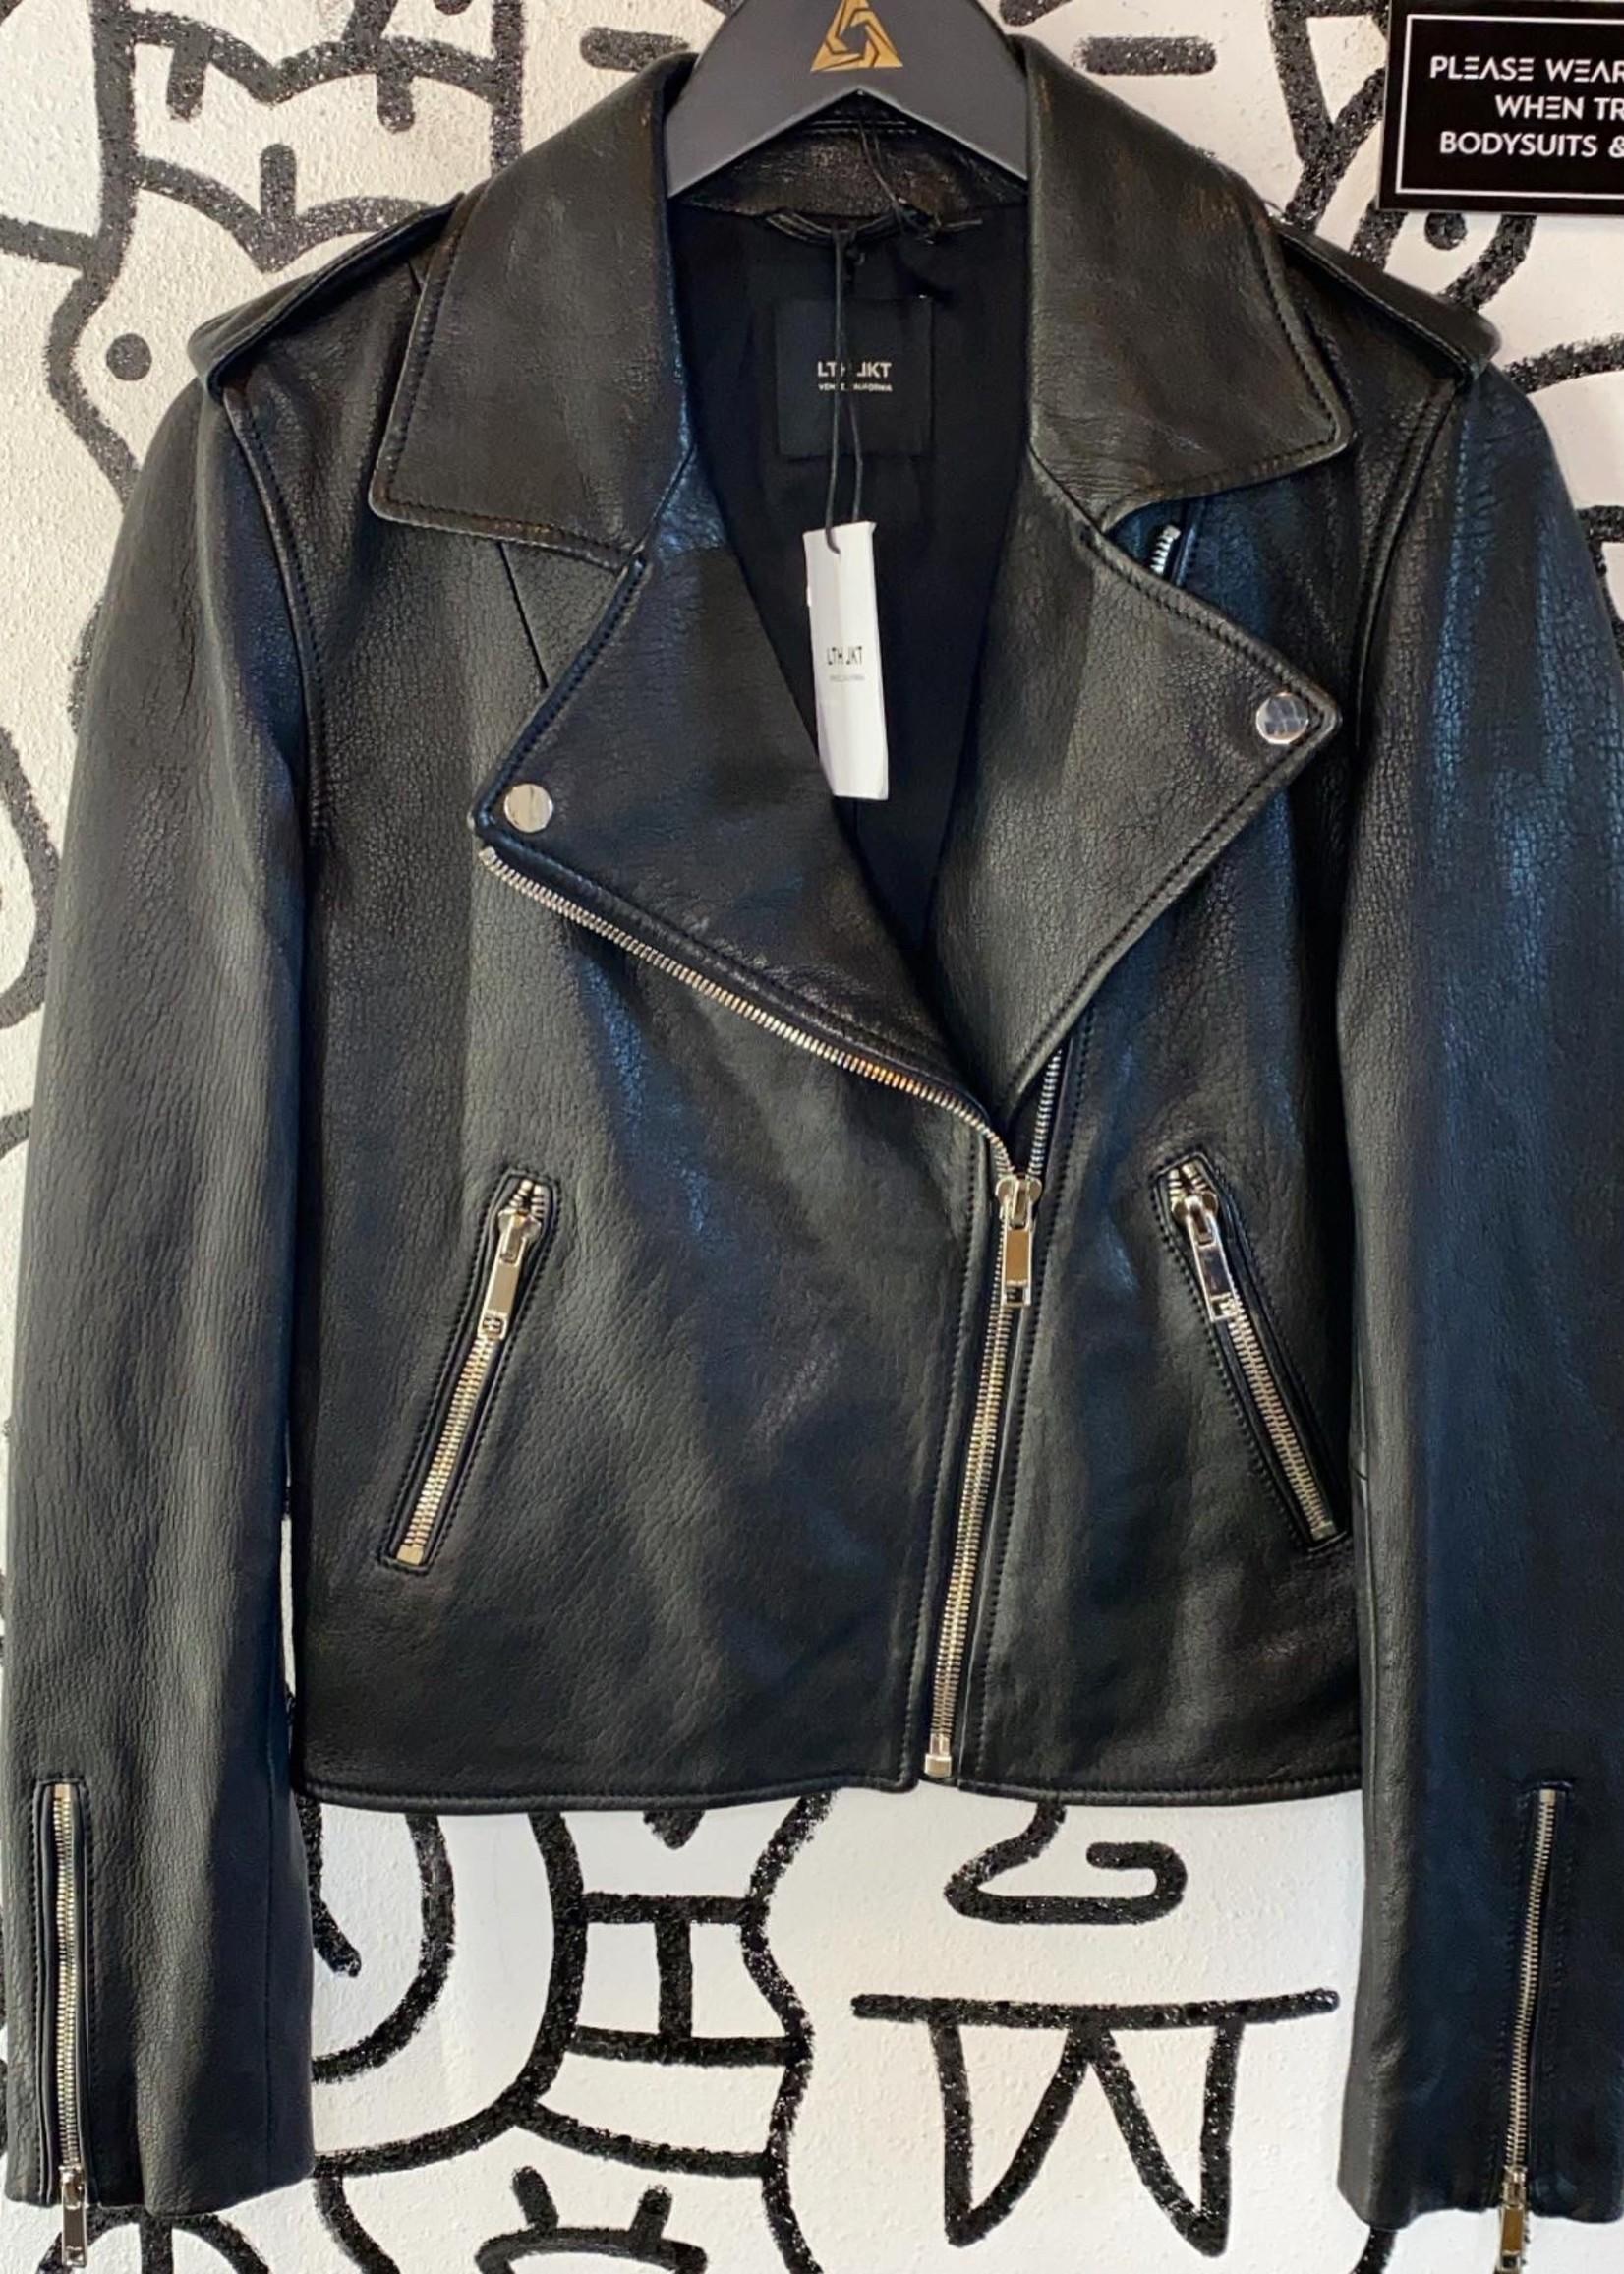 NWT LTH JKT Black Leather Jacket S